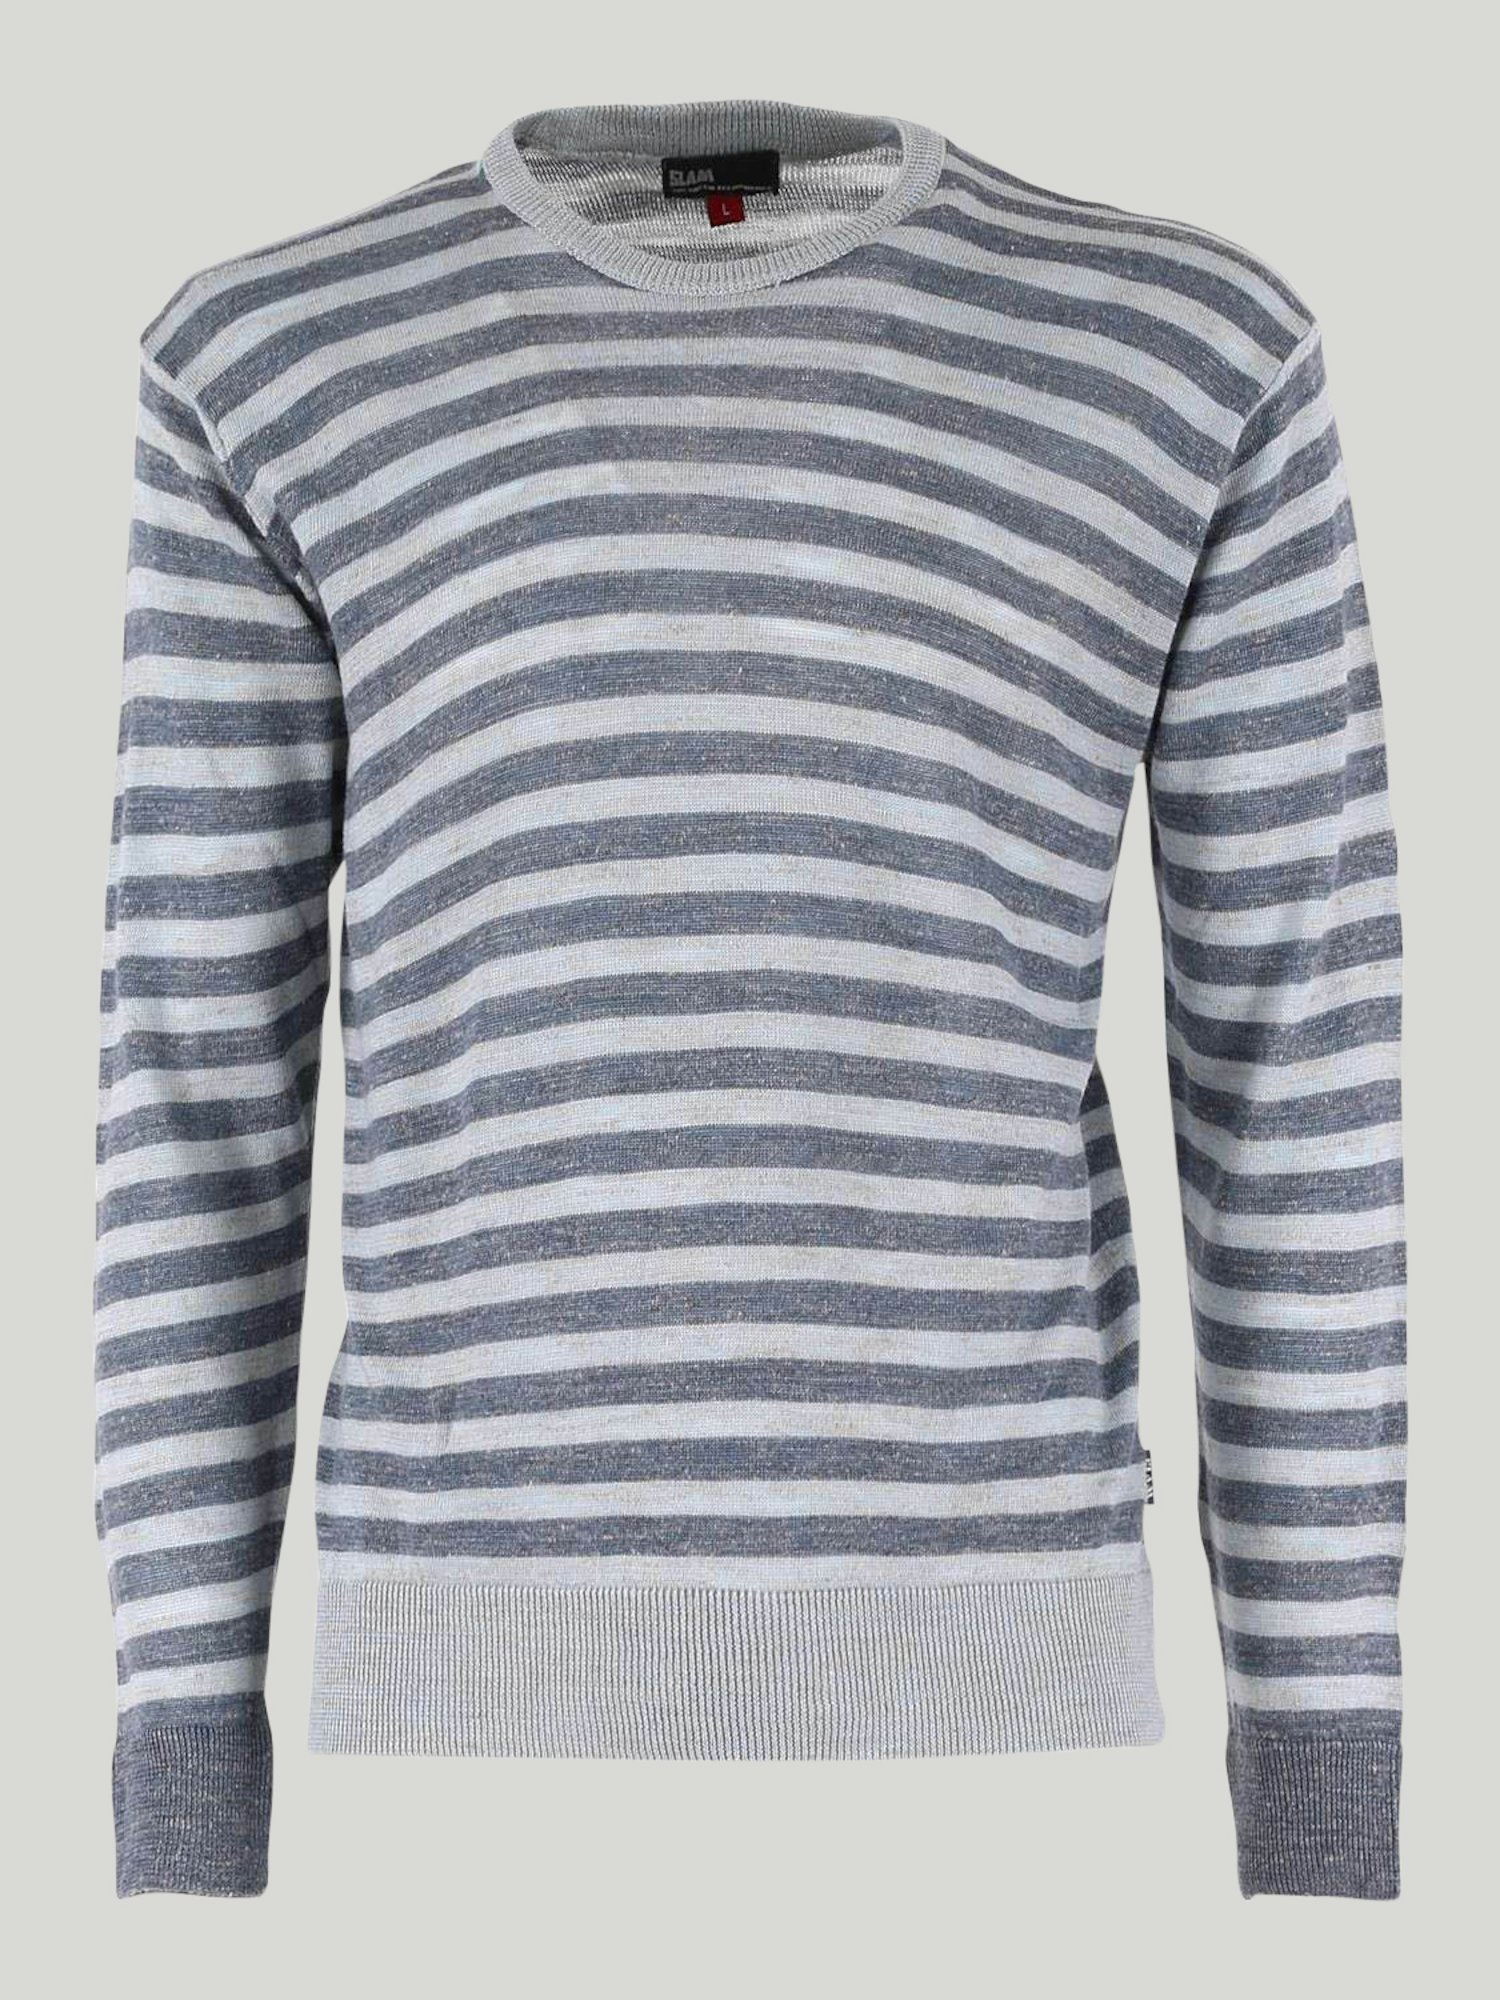 Tortuga Sweater - Deep Blue